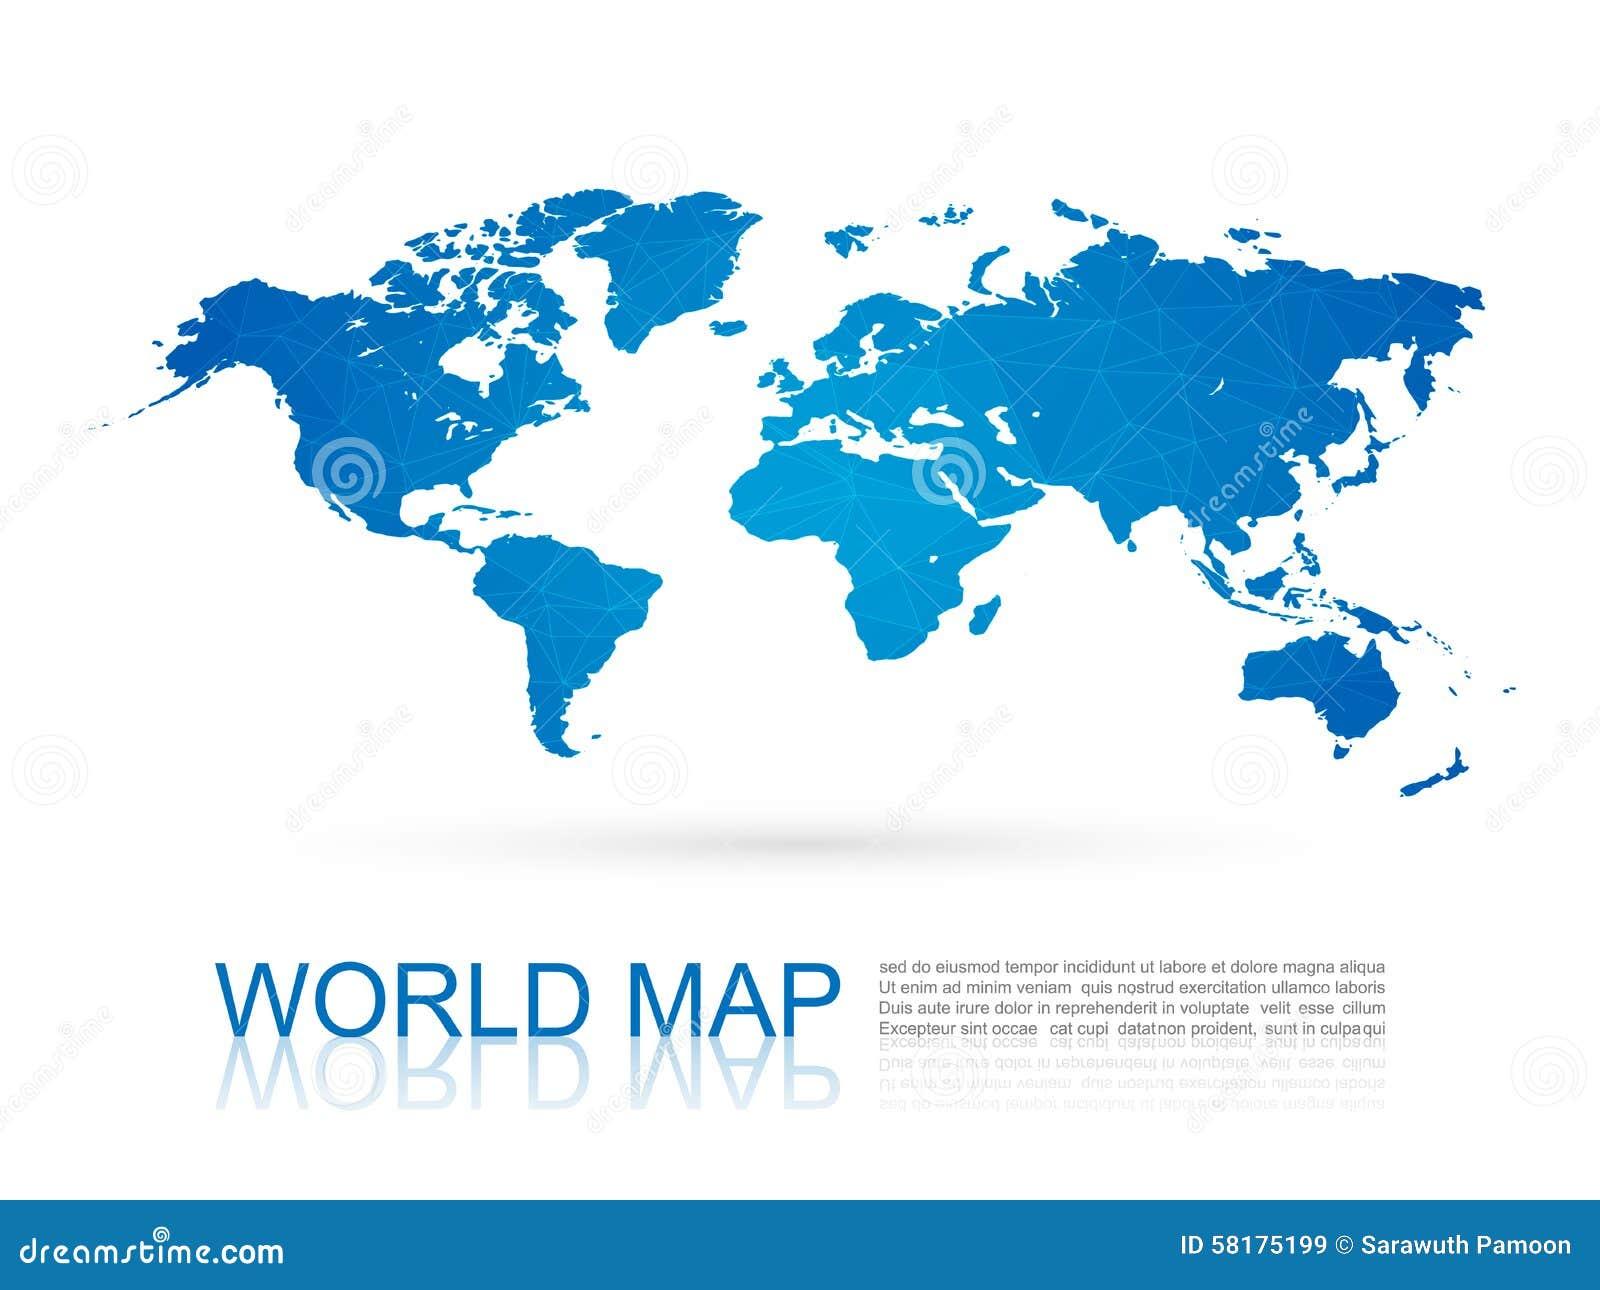 Polygonal world mapvector stock vector illustration of australia download polygonal world mapvector stock vector illustration of australia 58175199 gumiabroncs Images